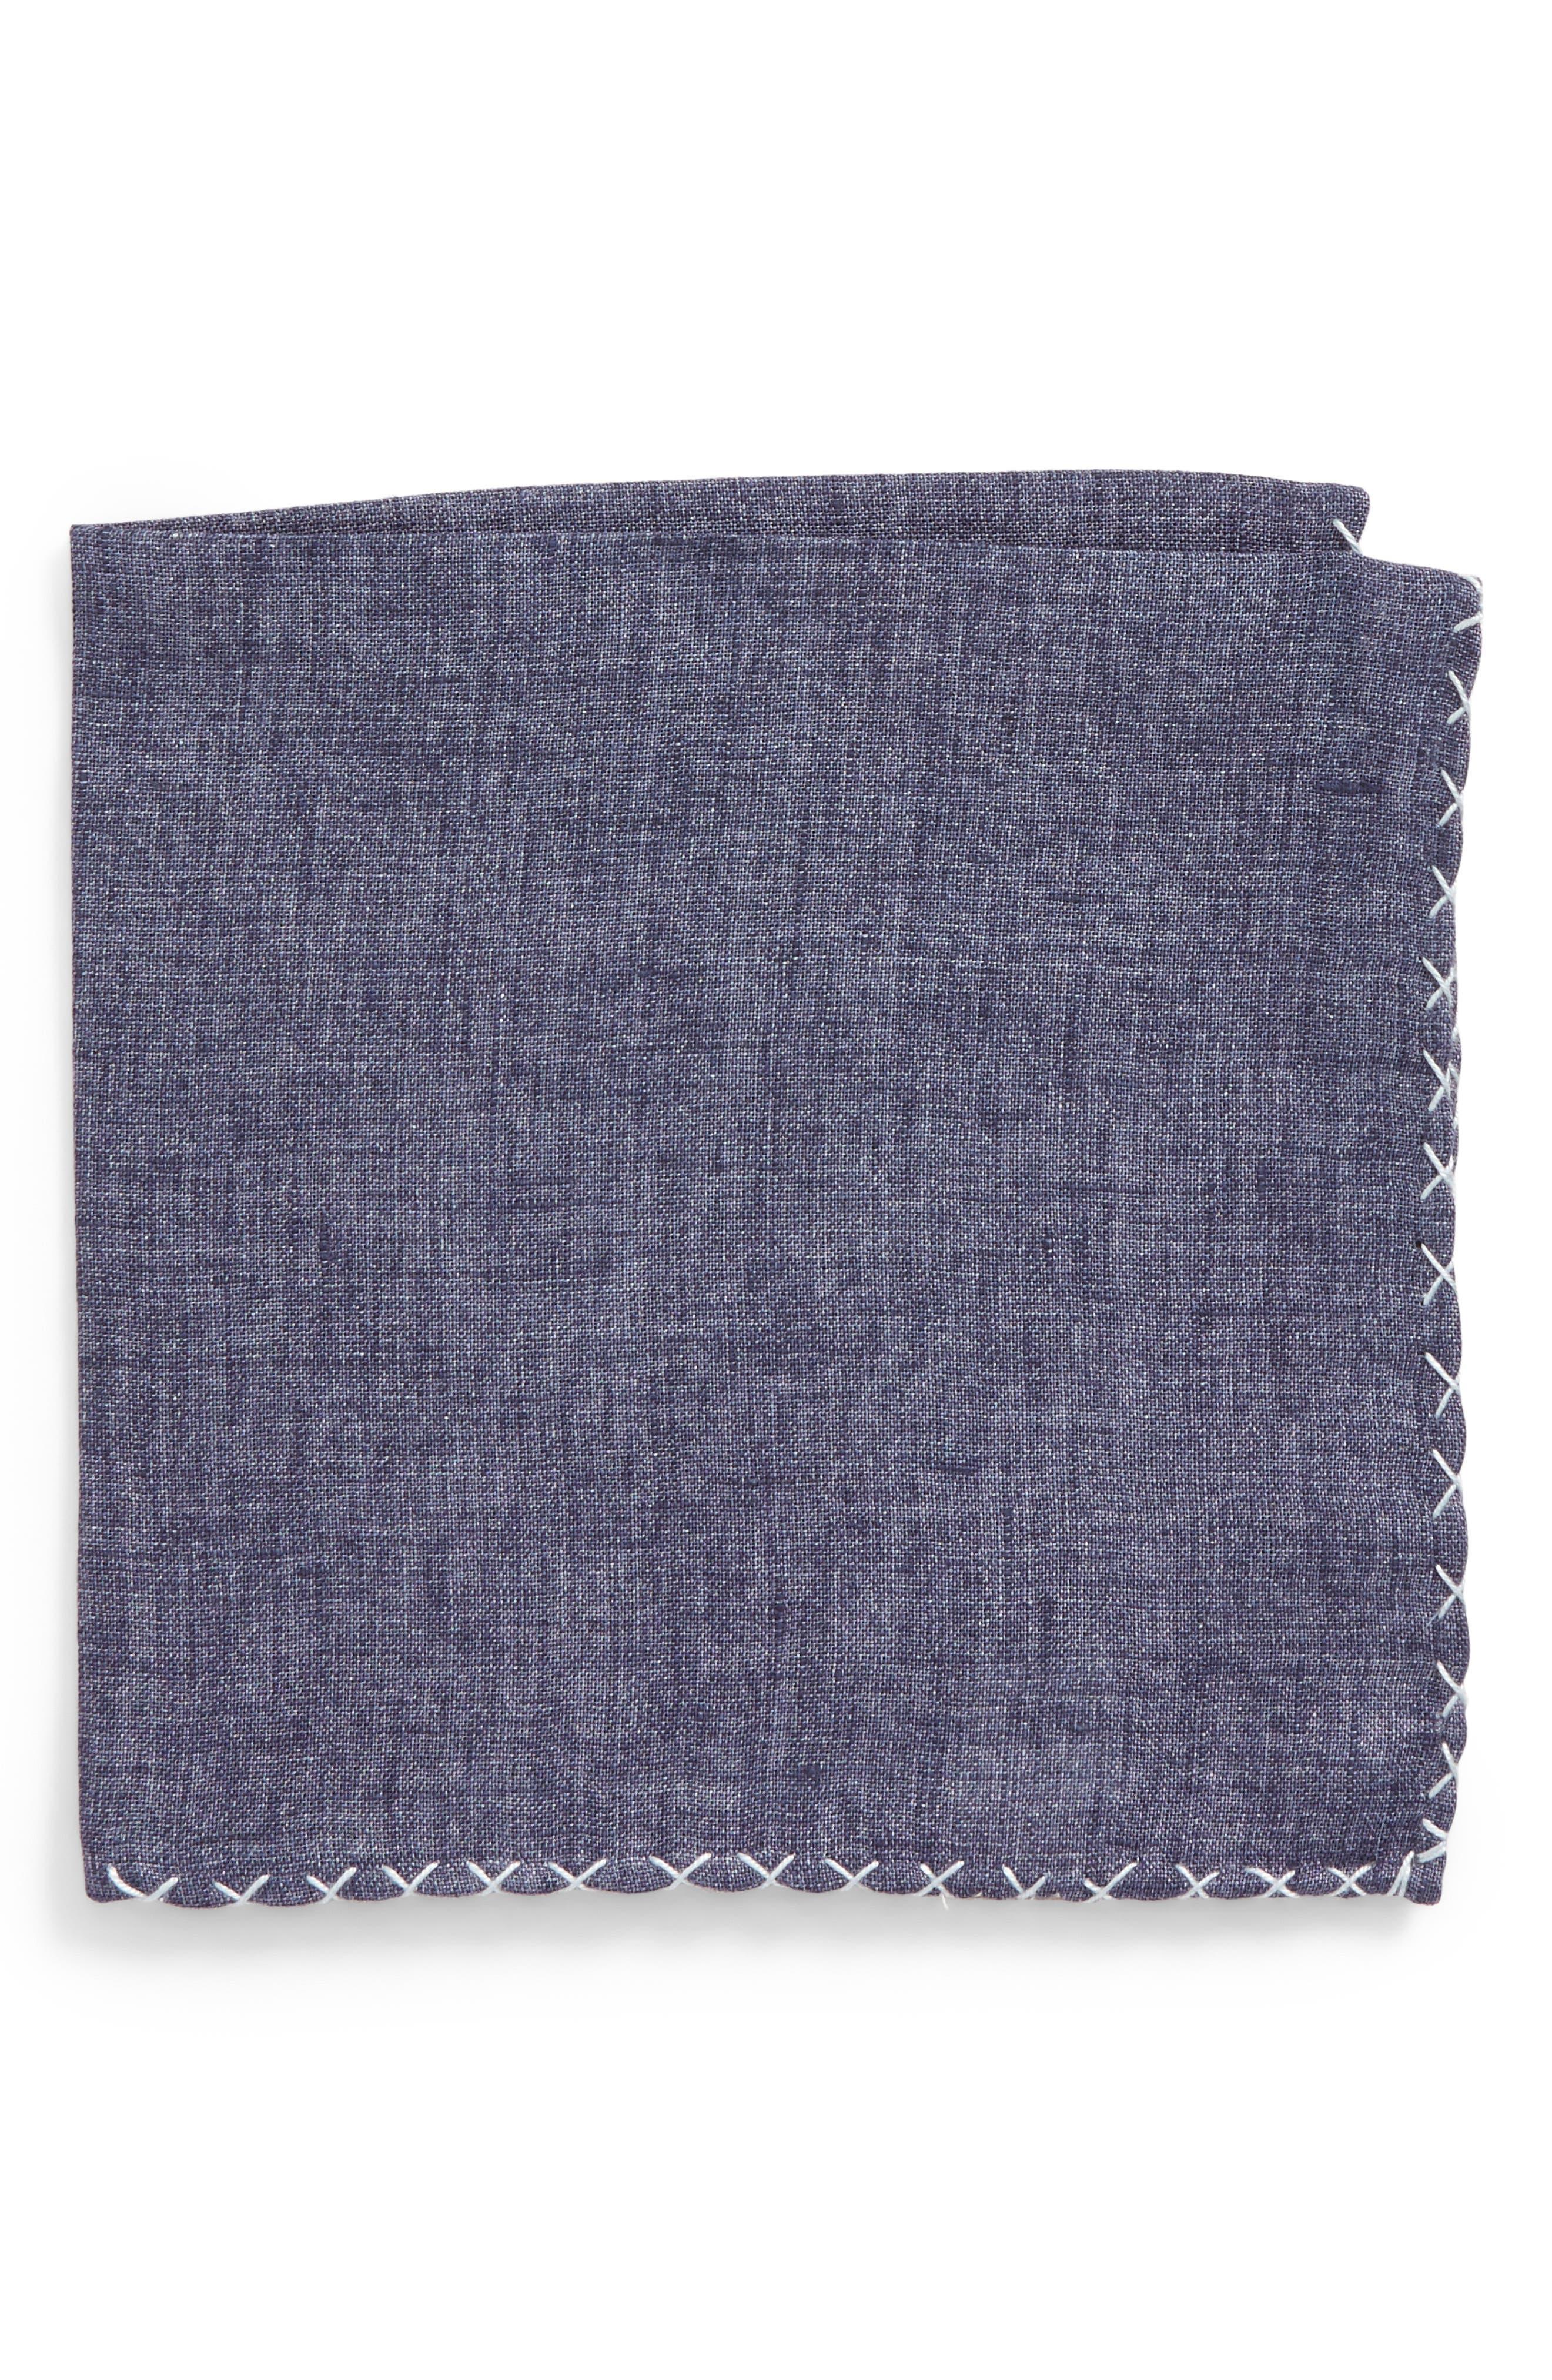 Solid Linen Pocket Square,                         Main,                         color, 020